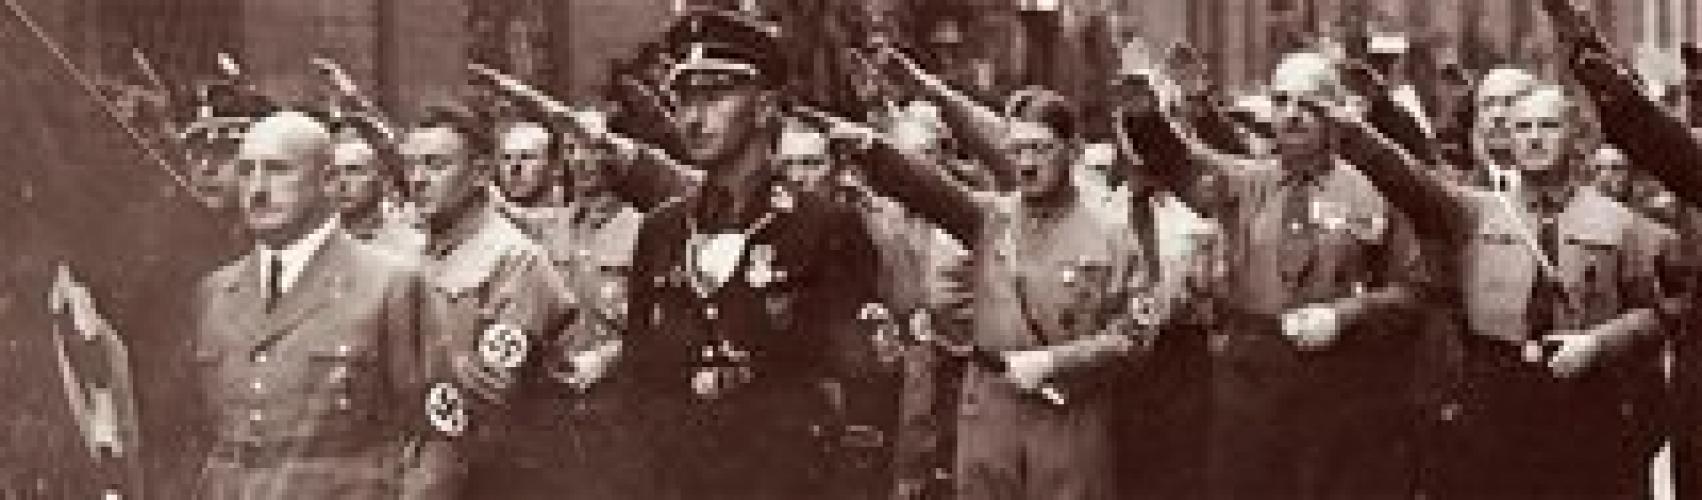 Secrets of the Third Reich next episode air date poster